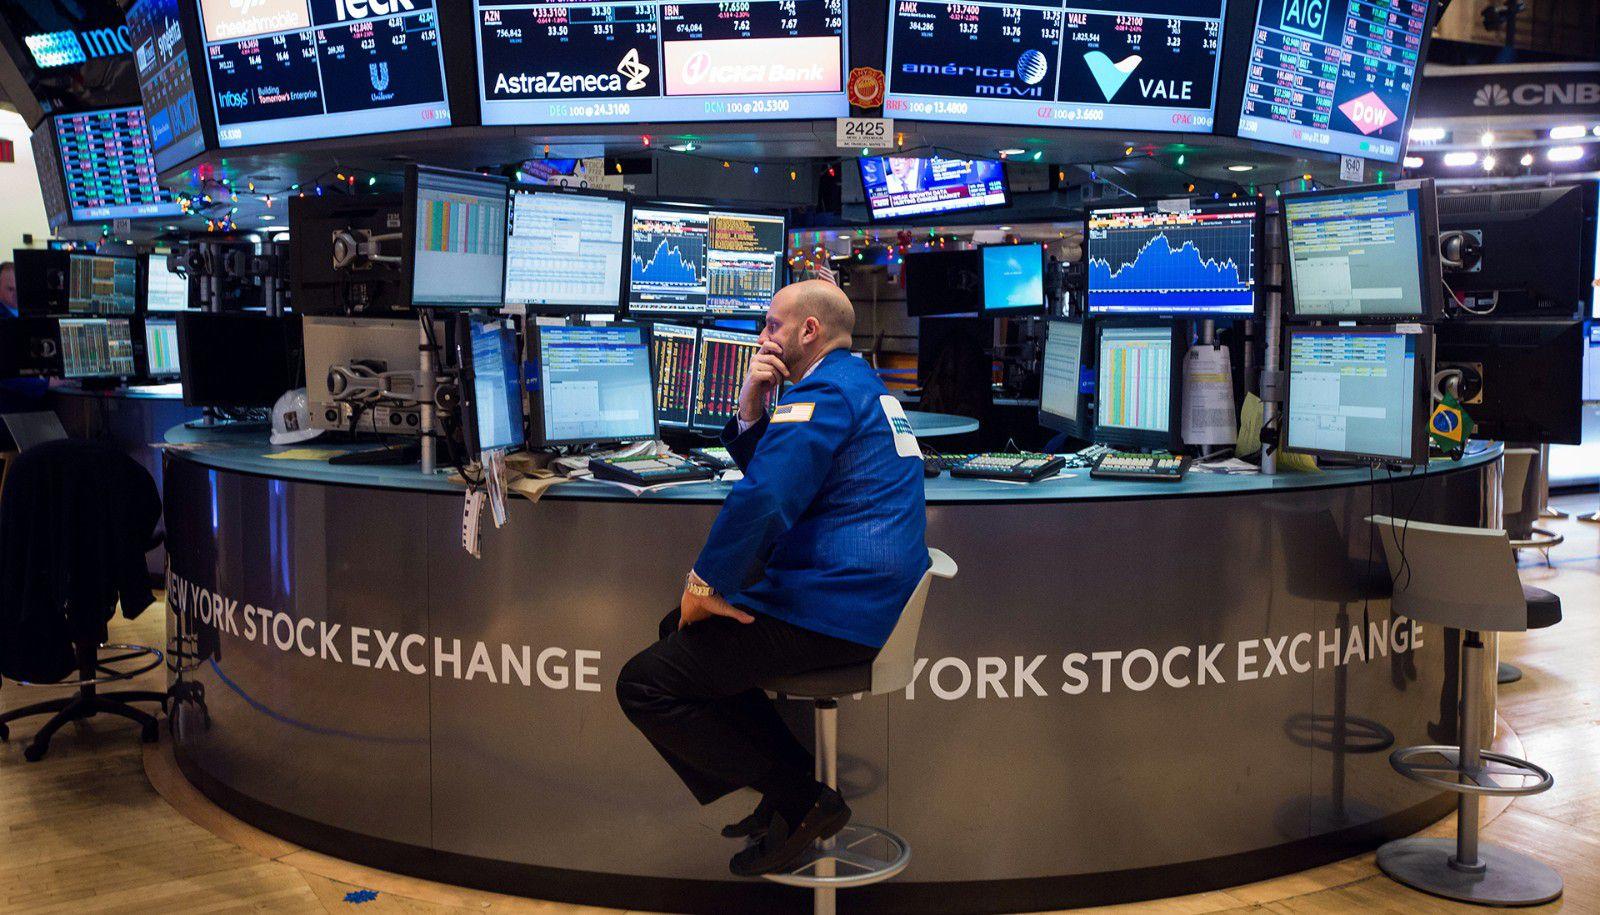 AvaTrade时事快讯:新冠疫情形势严峻,美国股指下跌严重